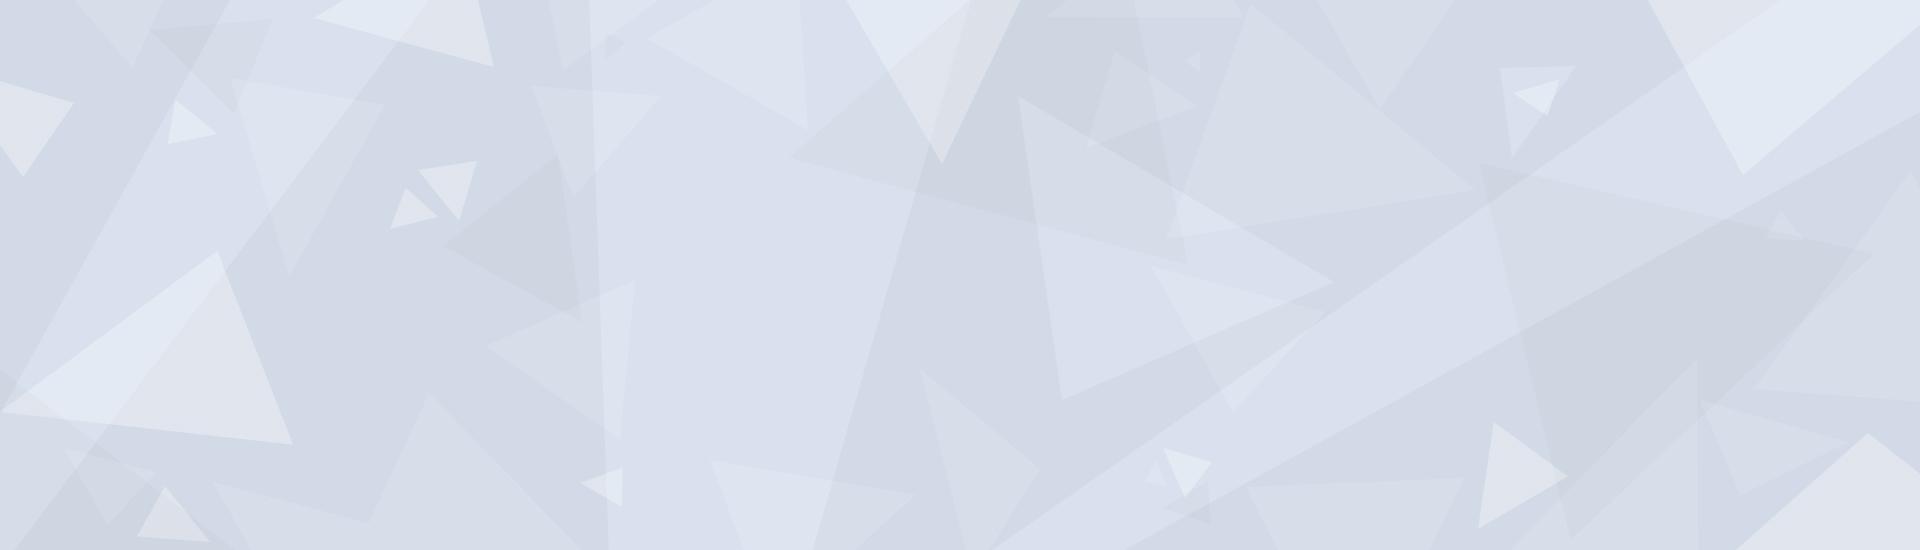 CloudSC - VSLeague Online eSport